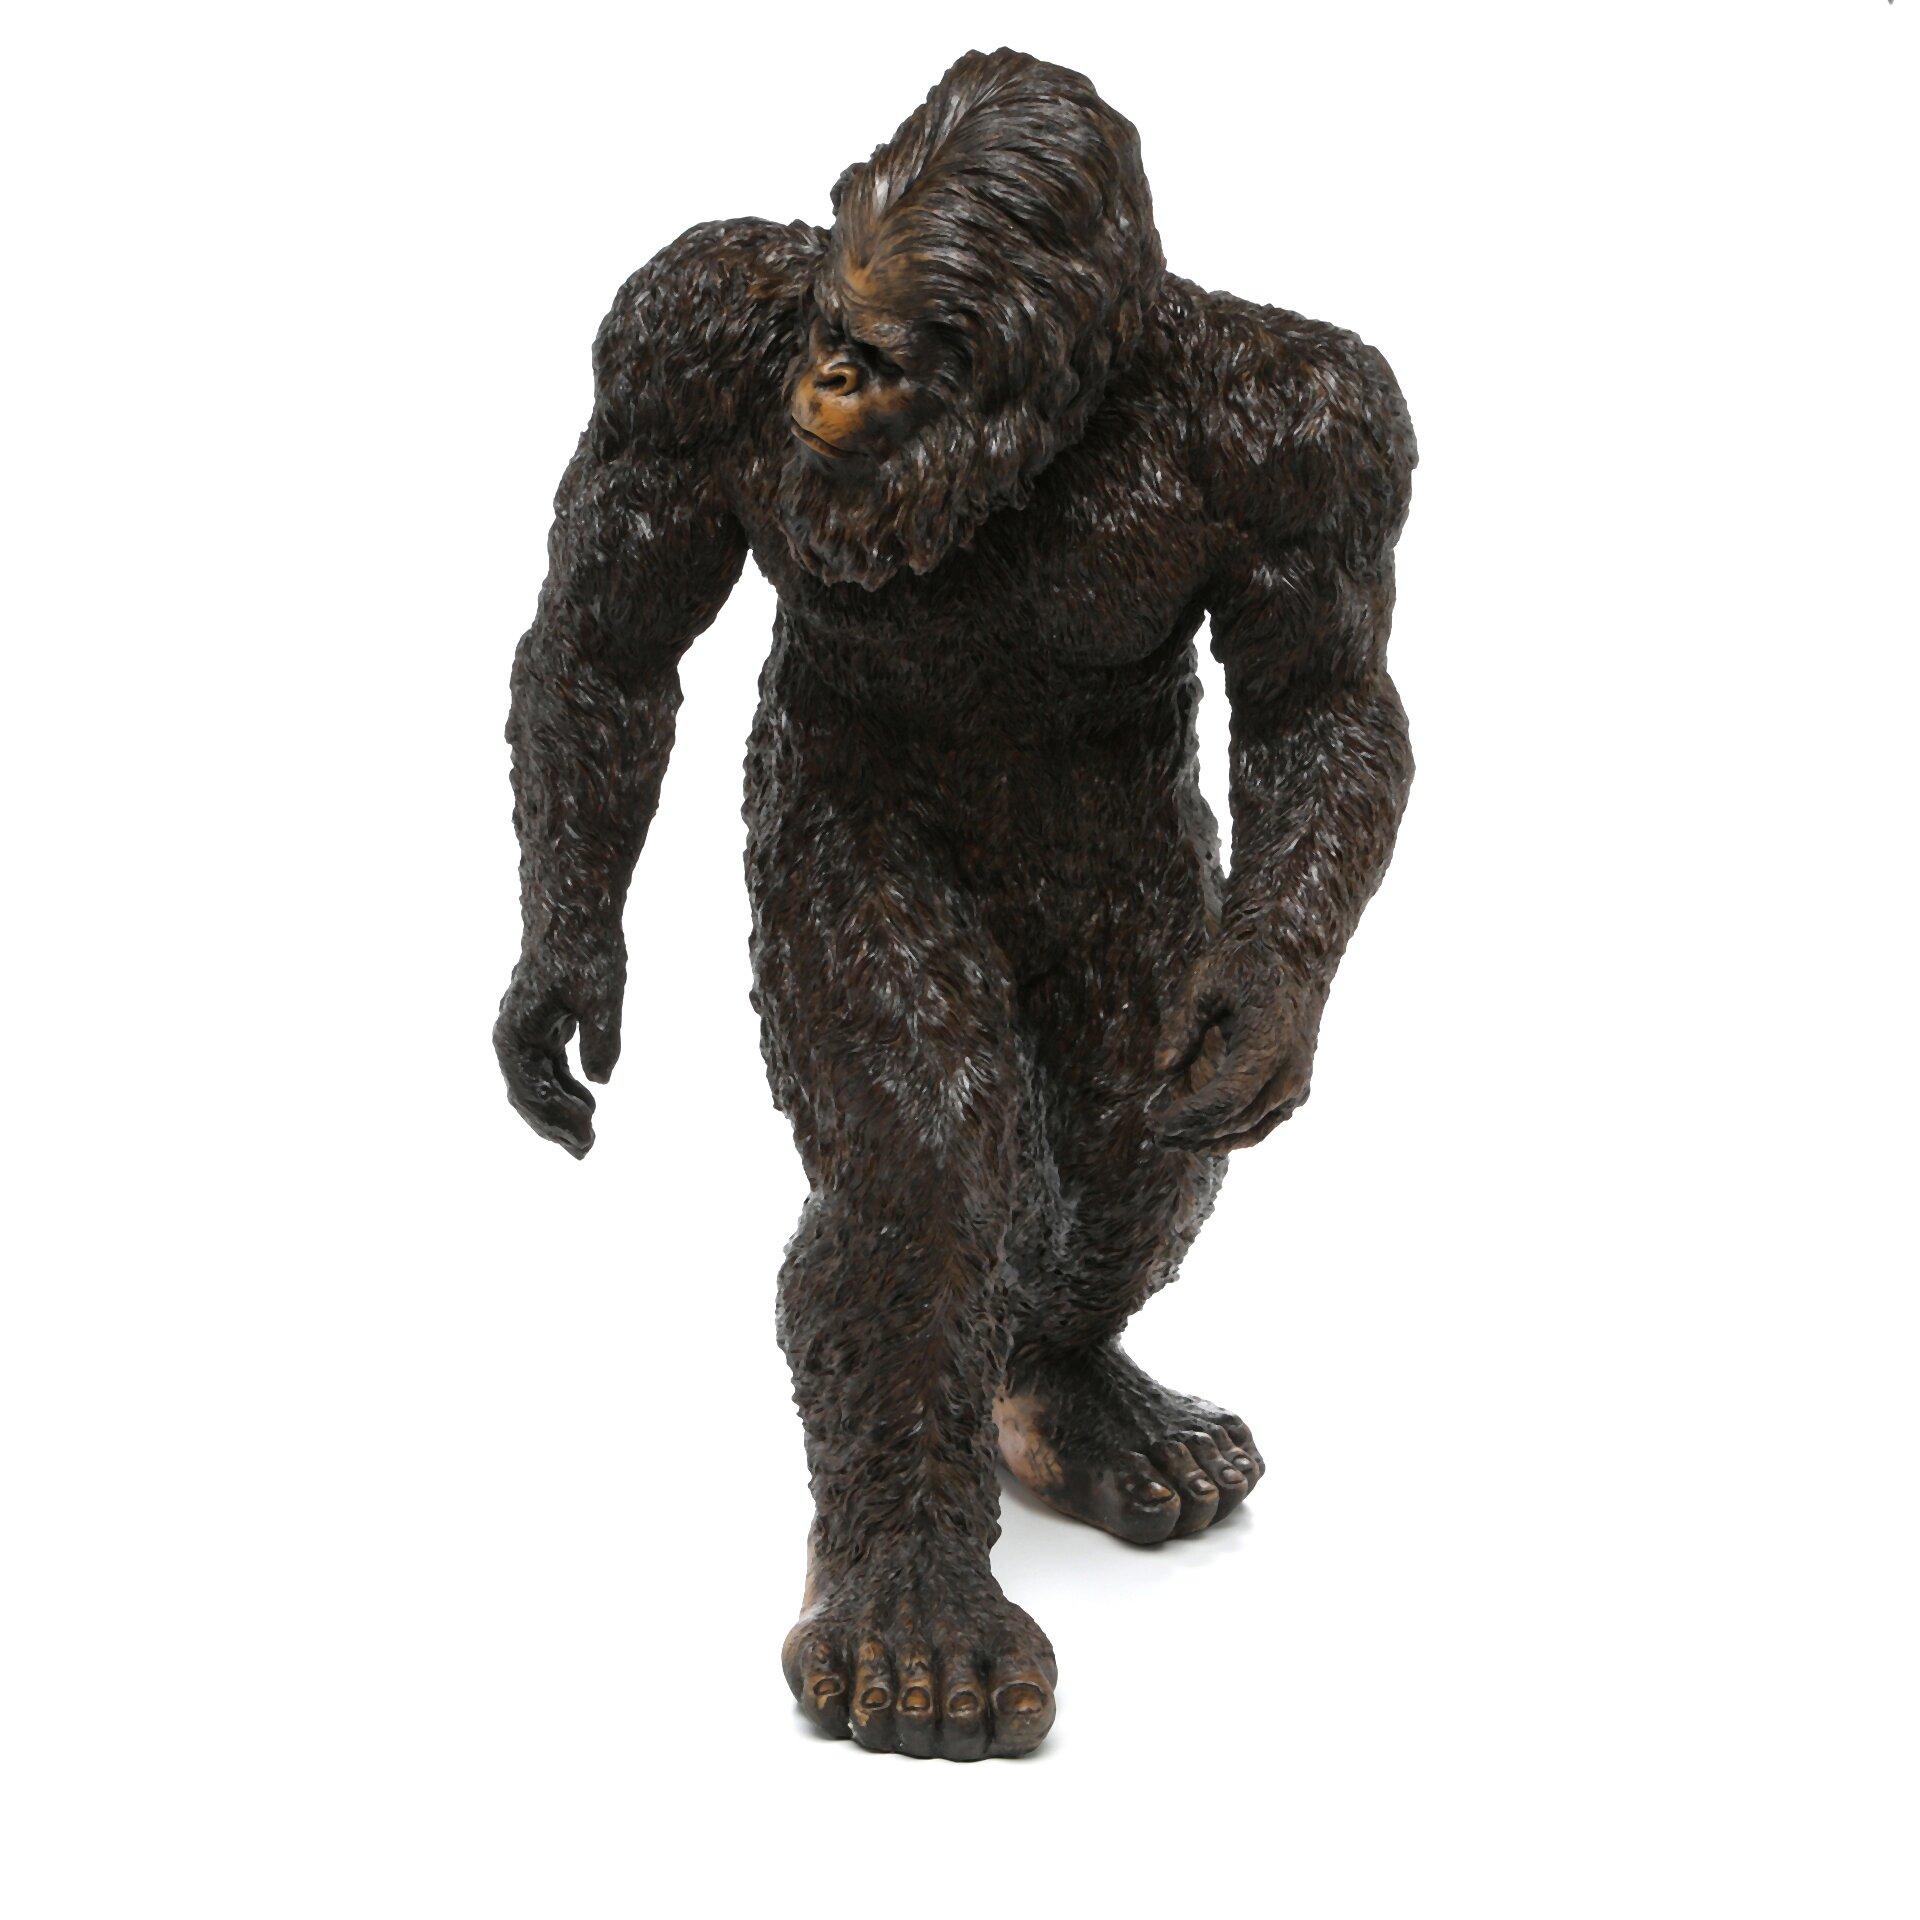 Design Toscano Bigfoot The Garden Yeti Statue & Reviews | Wayfair